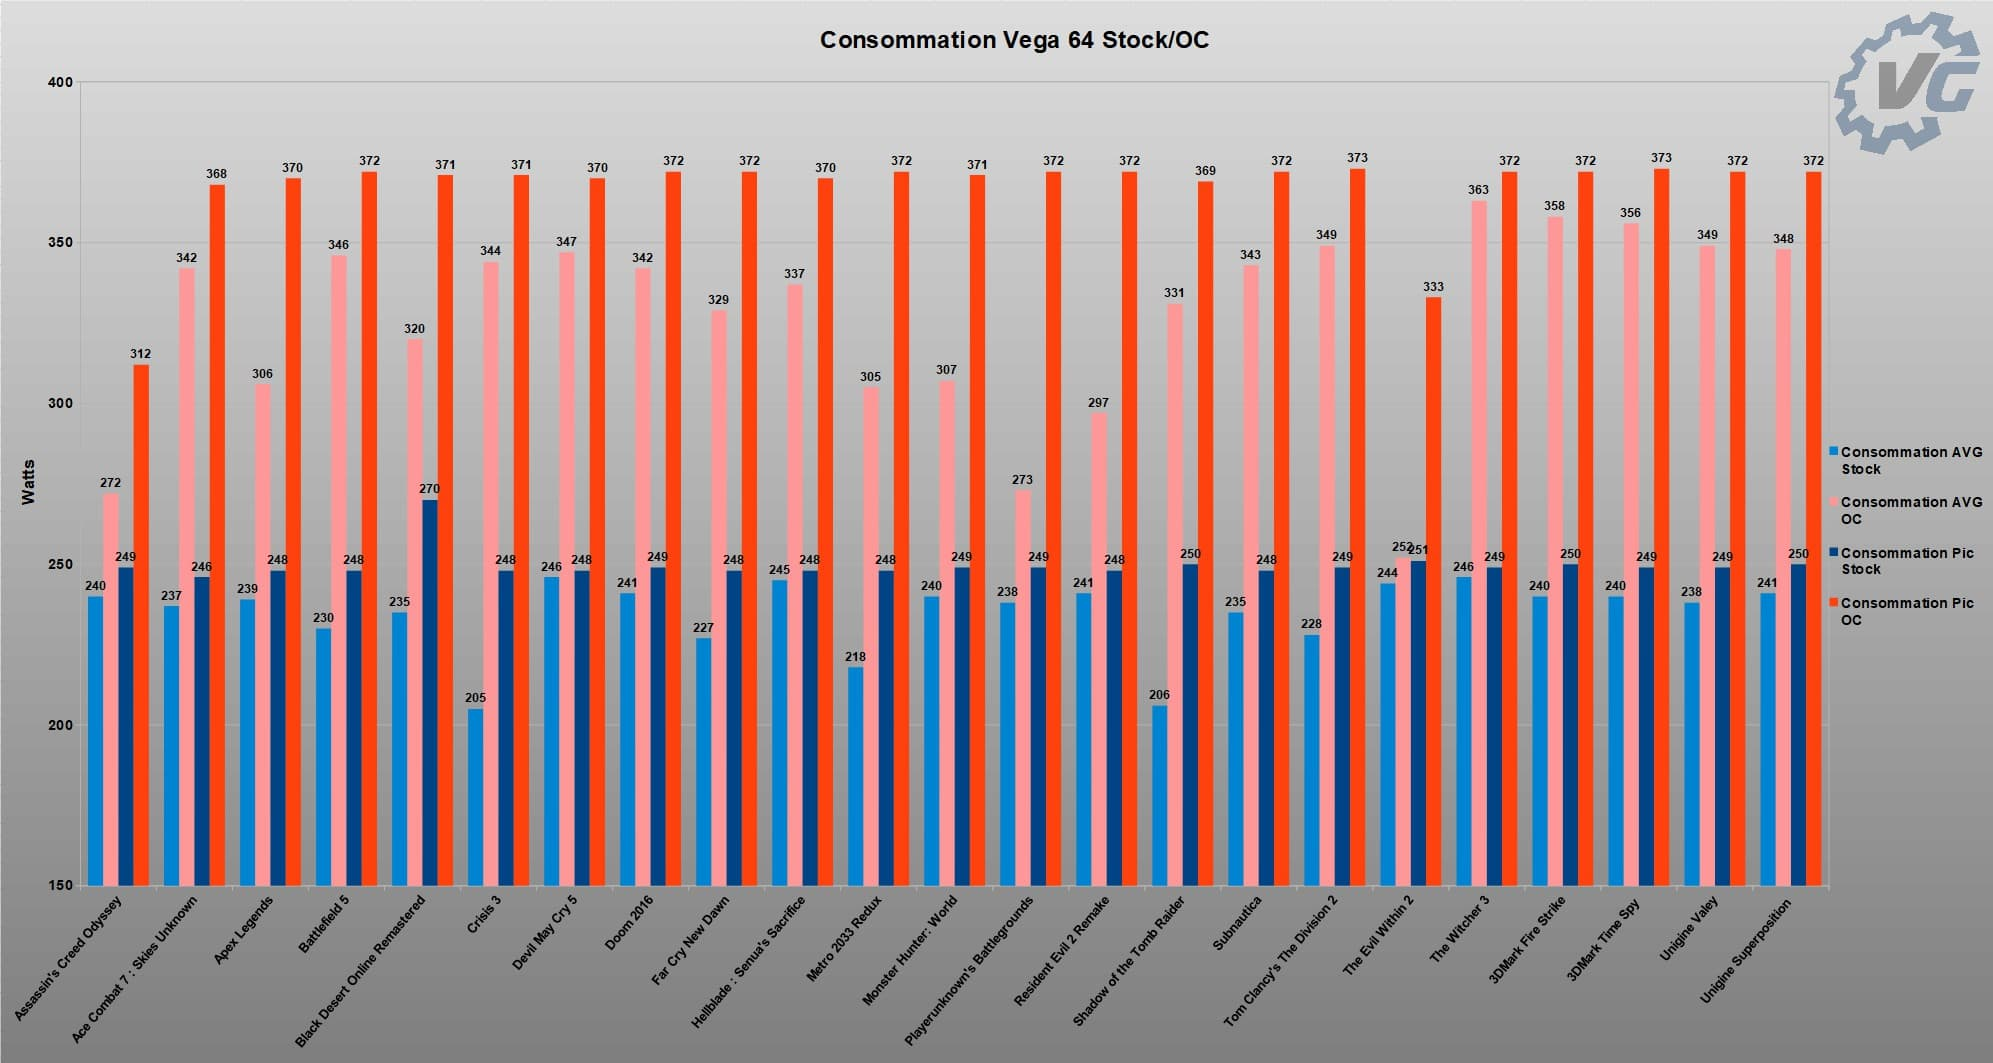 Graphique Consommation Vega 64 Stock Overclocké